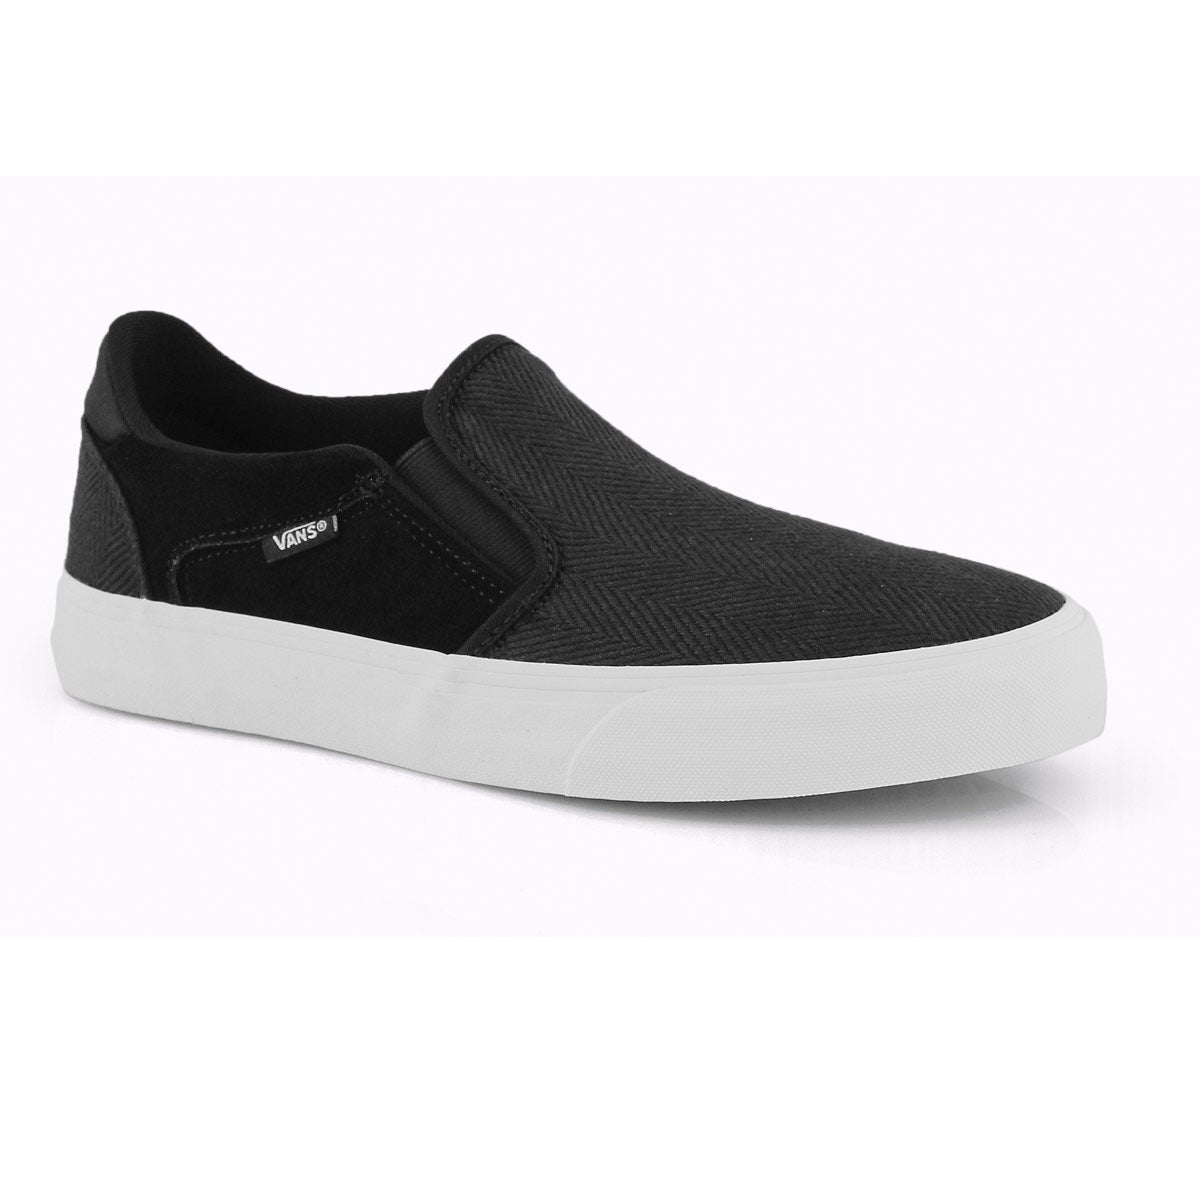 high fashion closer at sneakers for cheap Vans Men's ASHER DELUXE black/ white slip on   SoftMoc.com